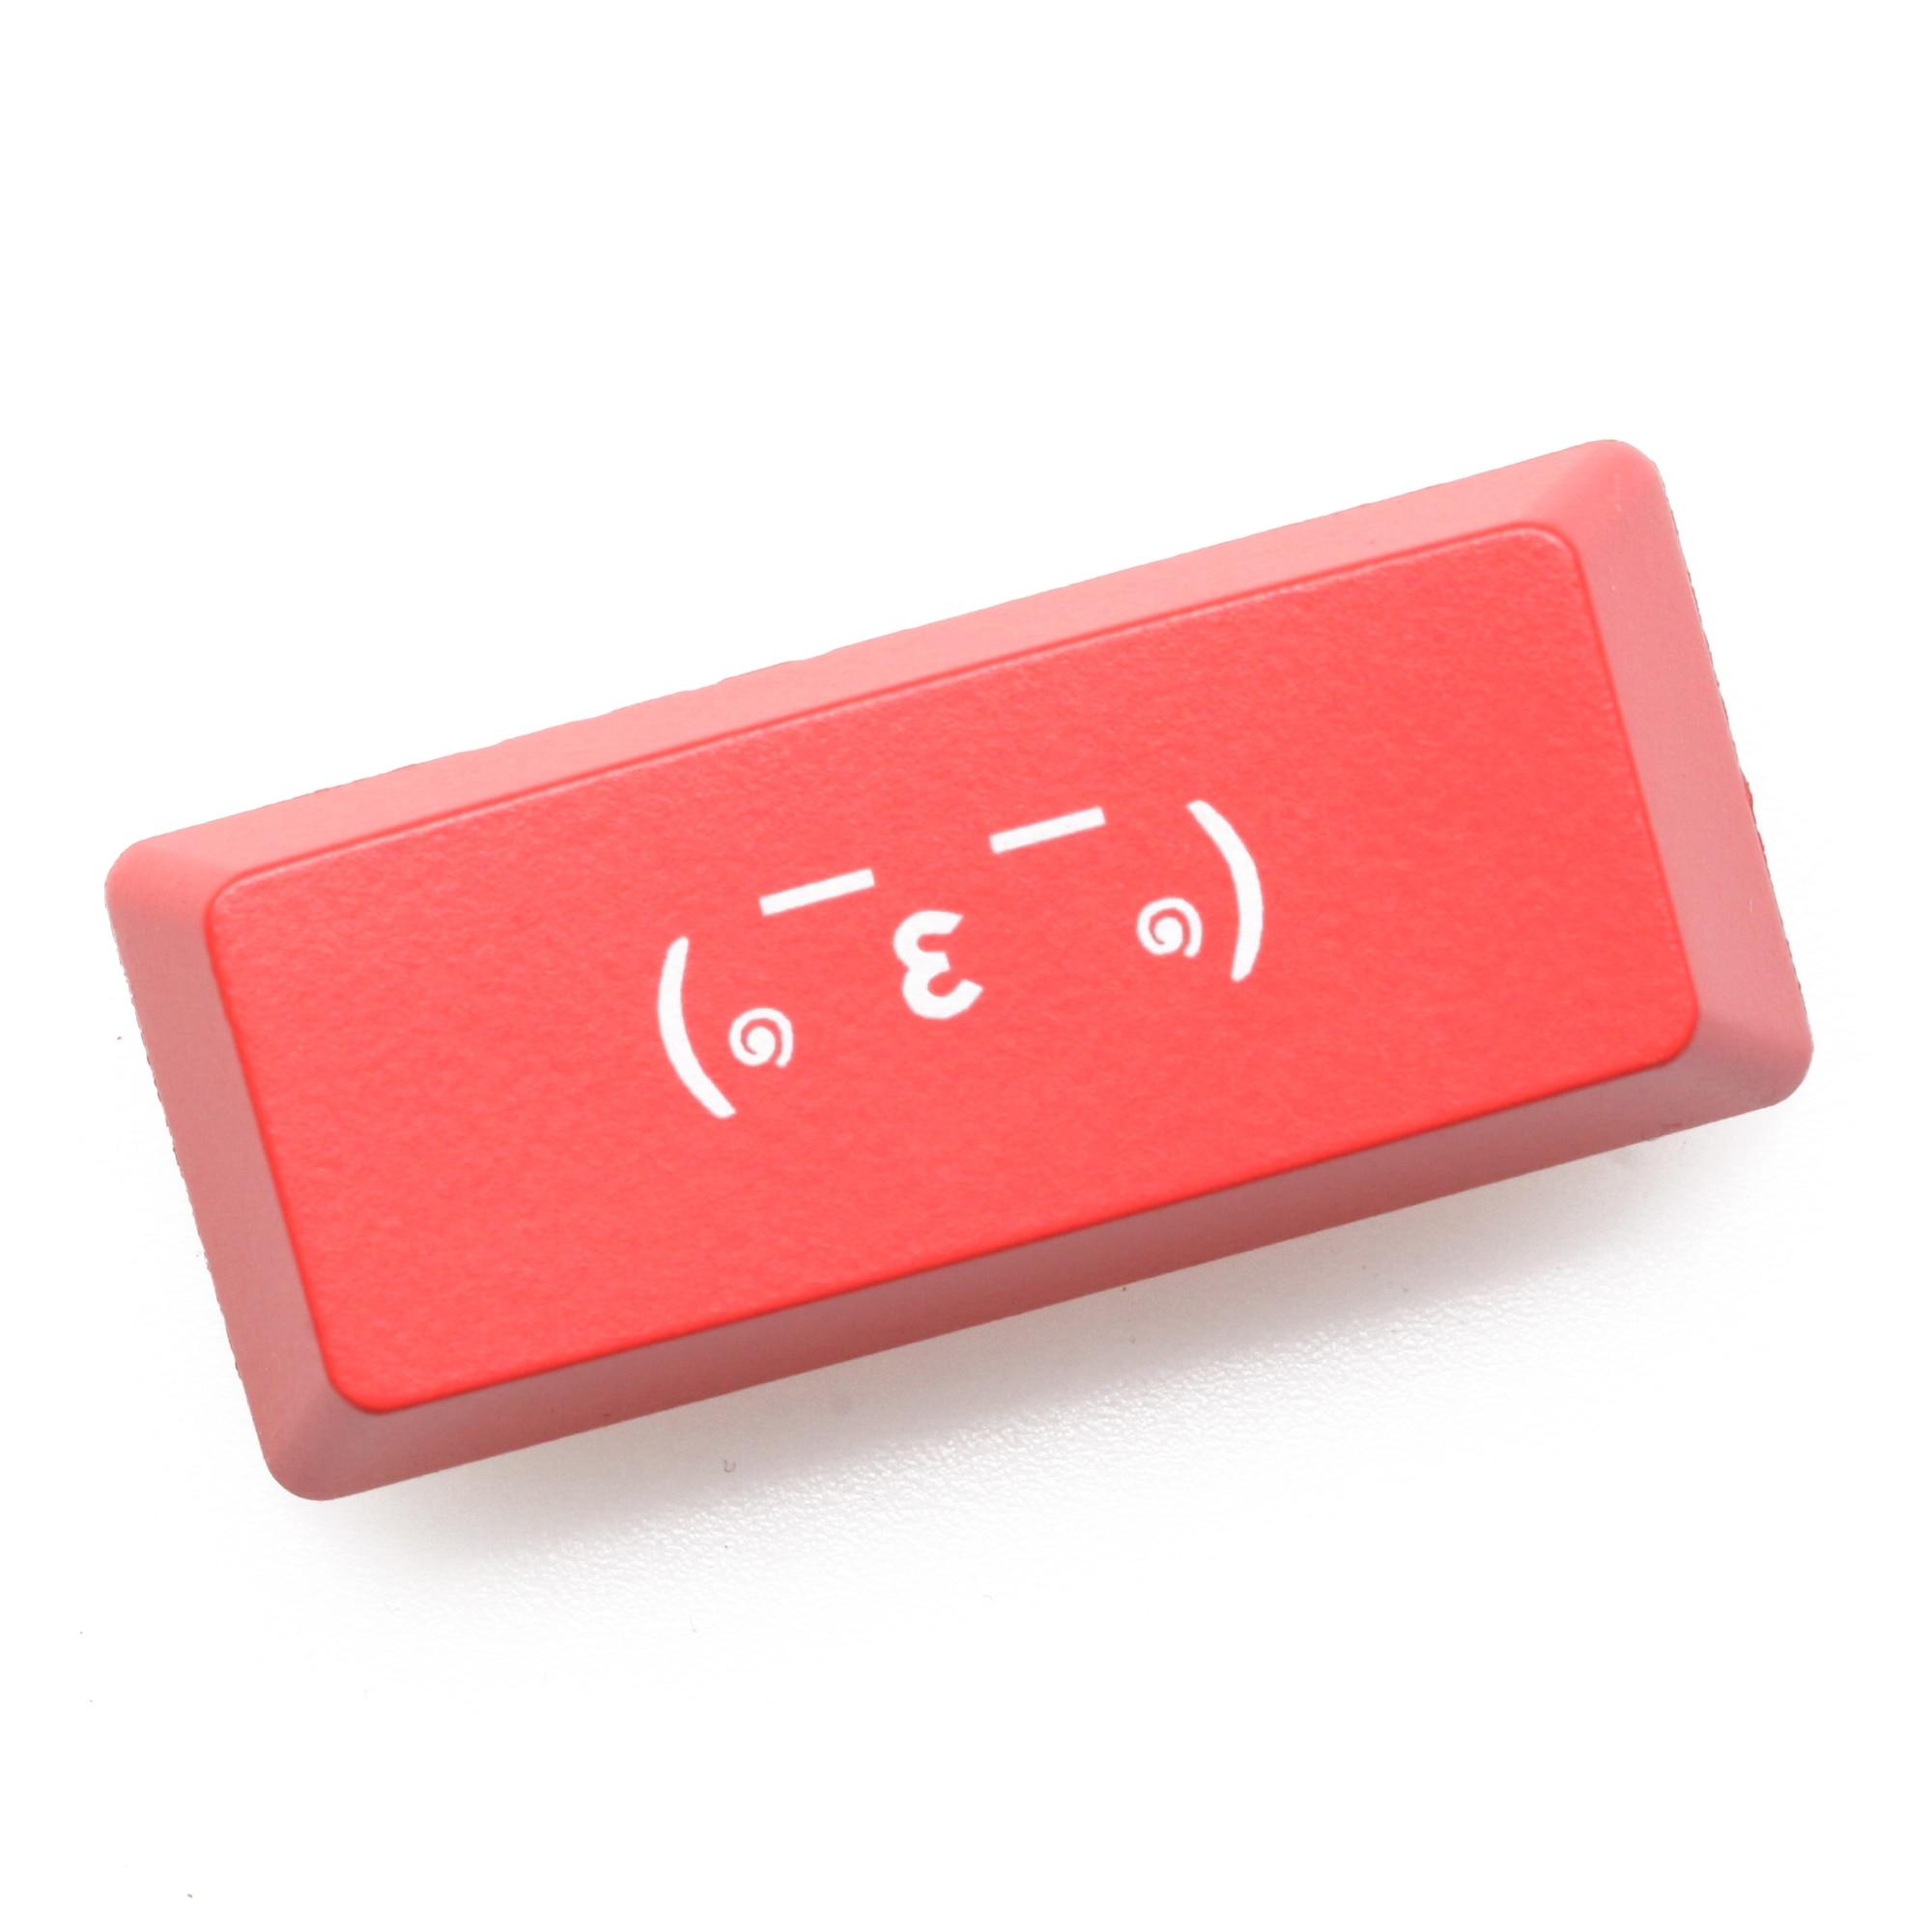 Novelty Shine Through Keycap ABS Etched Shine-Through Left Shift 1.25u Alt 2.25u Shift Kaomoji Sleep Kiss Snicker